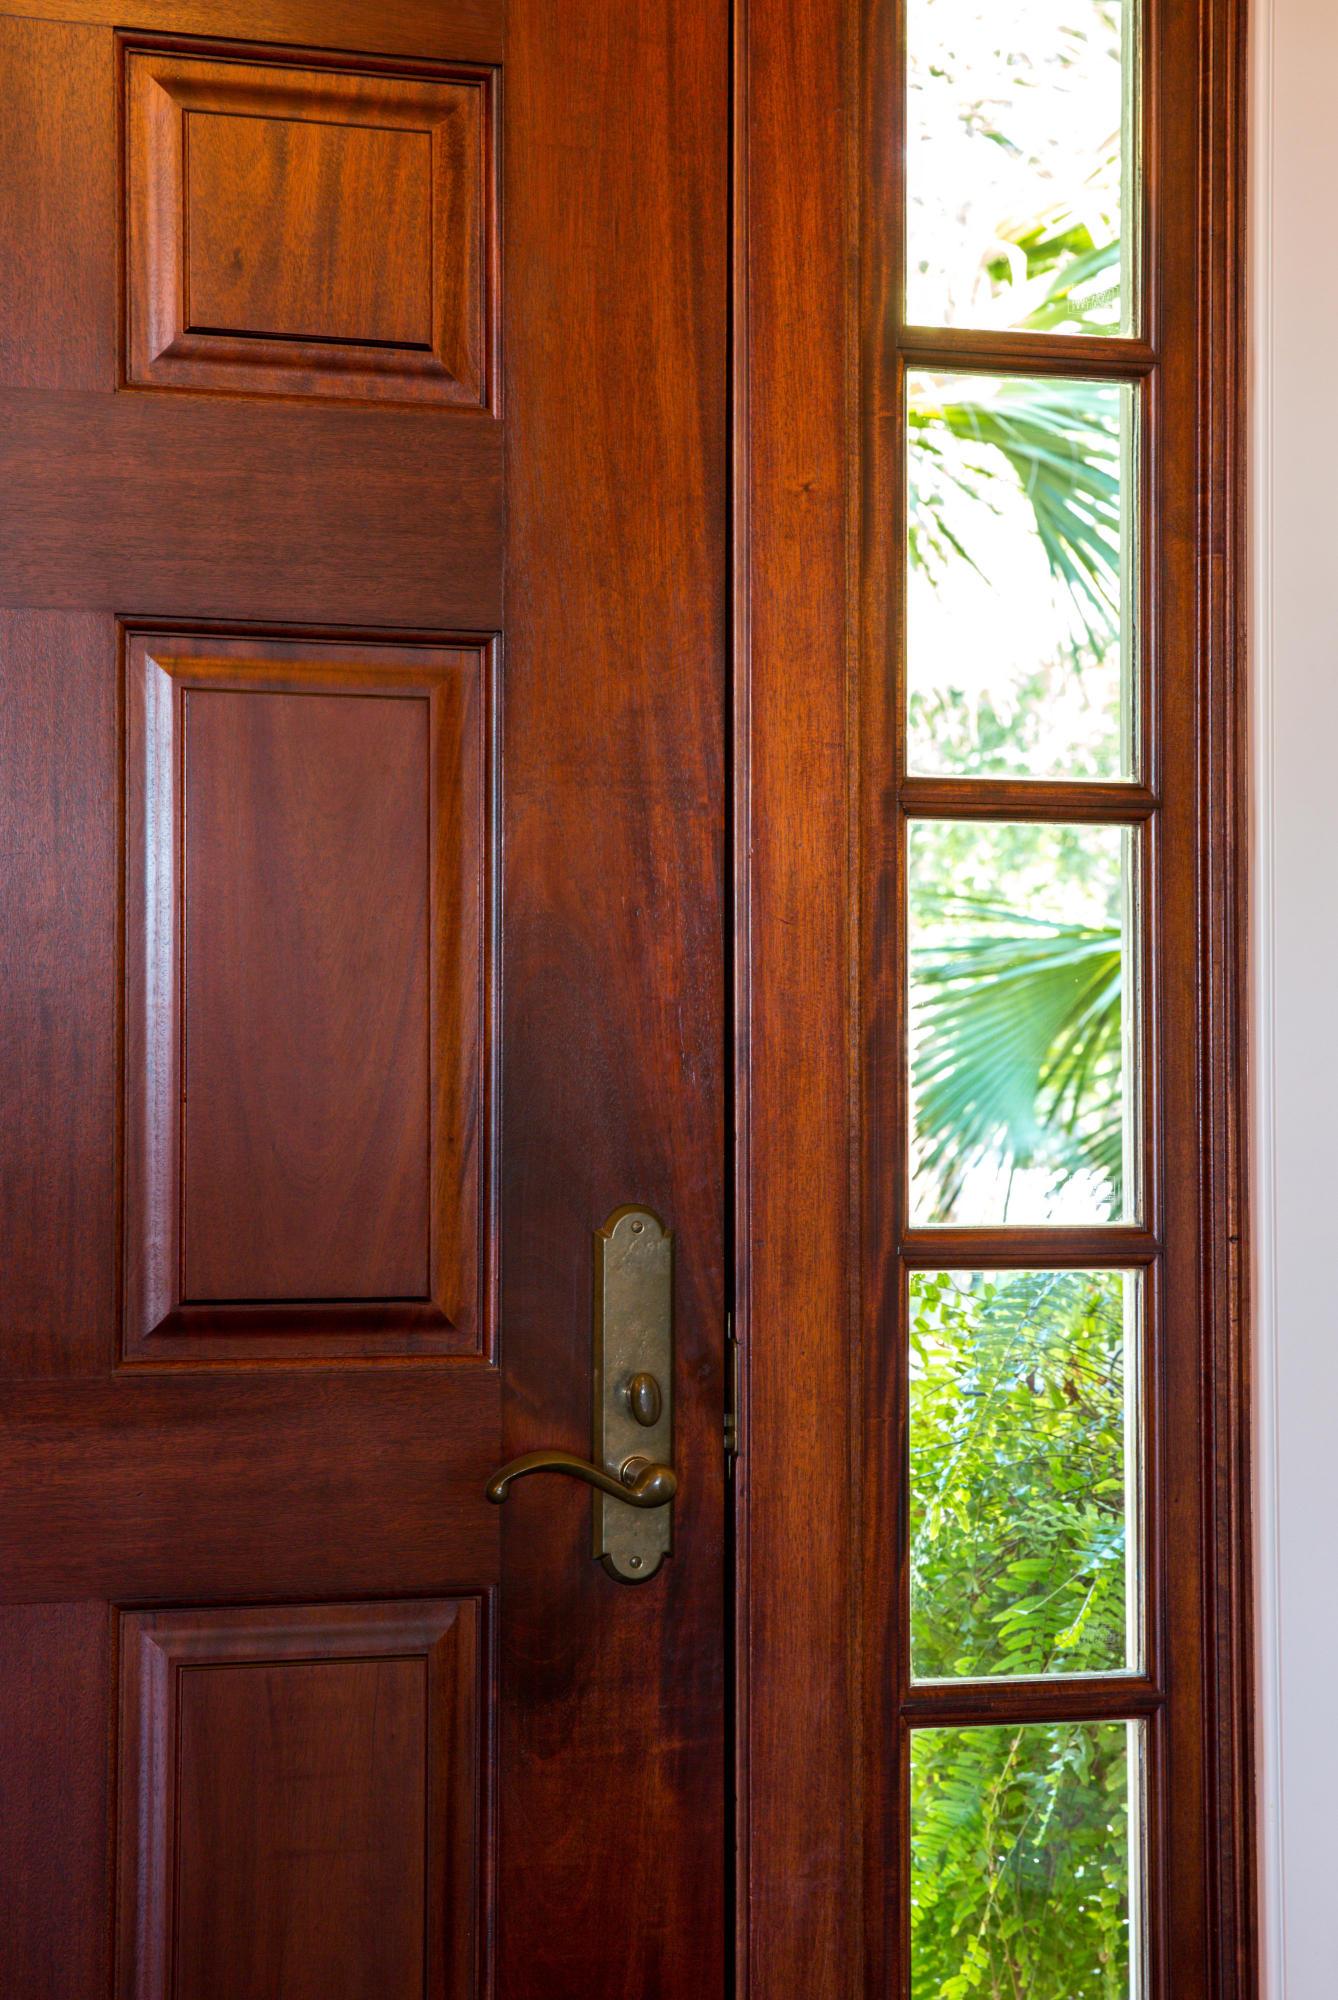 Kiawah Island Homes For Sale - 6 Summer Islands, Kiawah Island, SC - 3